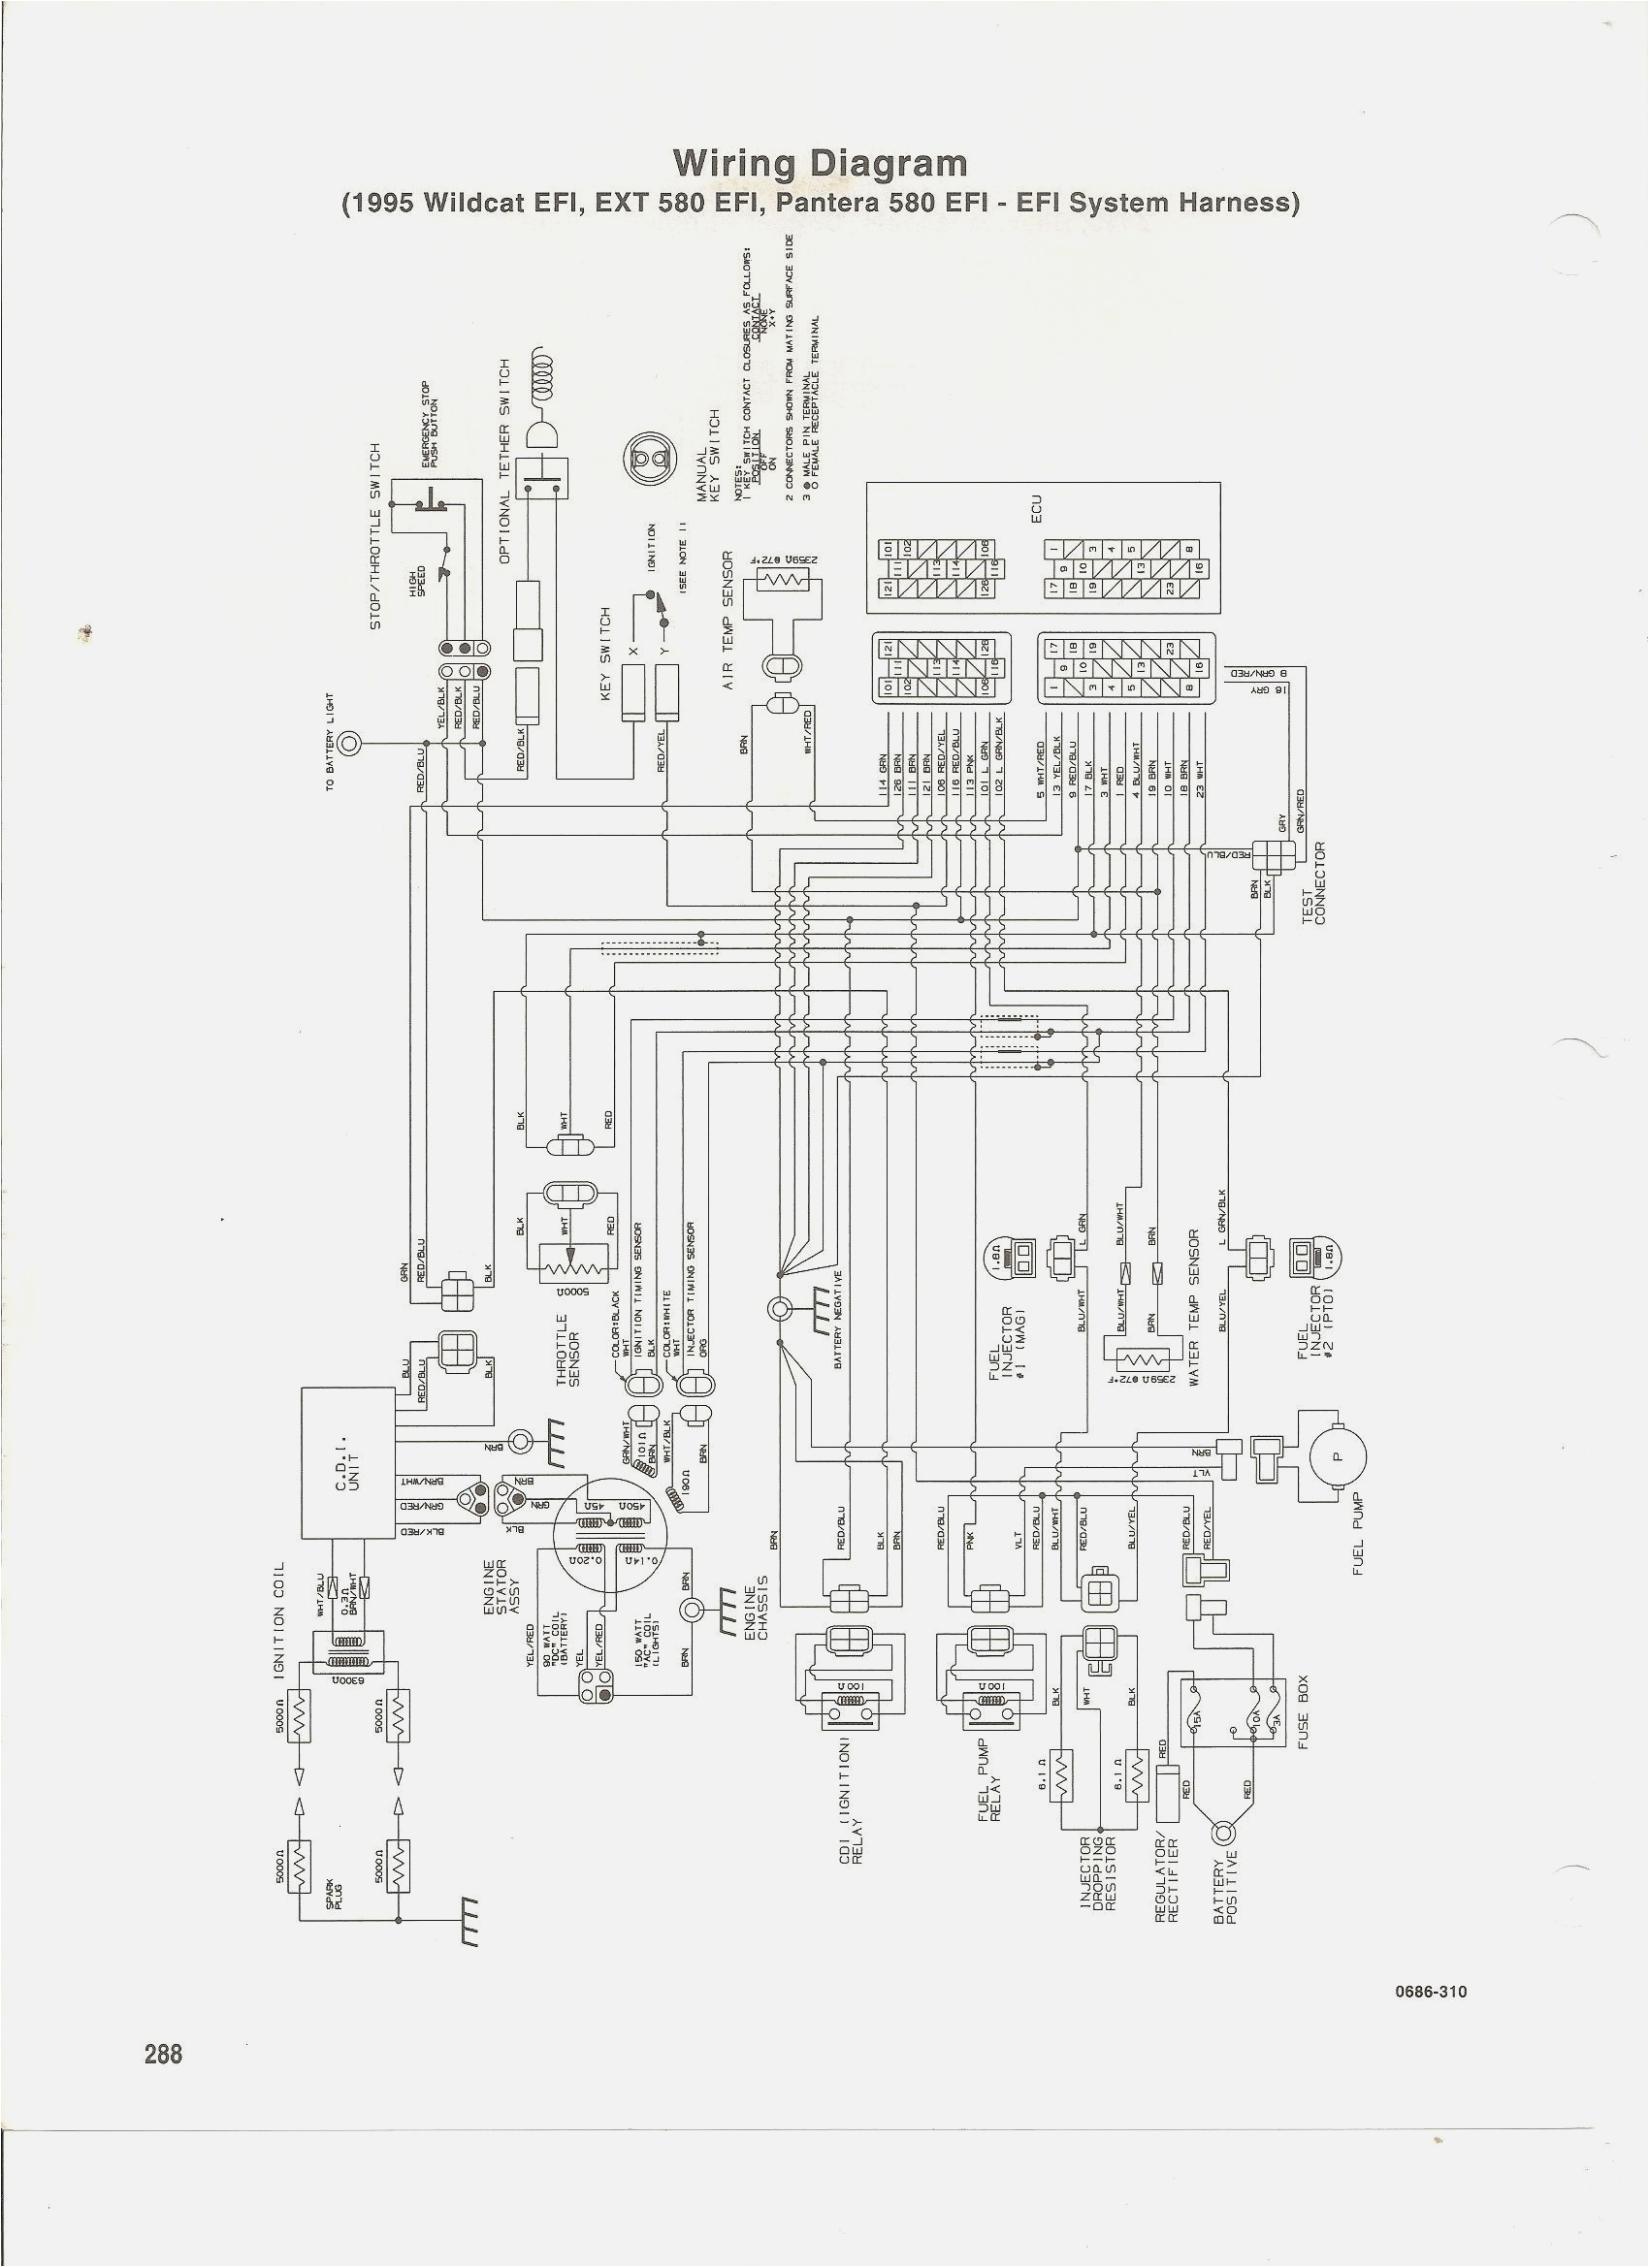 cat v4 0b wire diagram wiring diagram cat v4 0b wire diagram